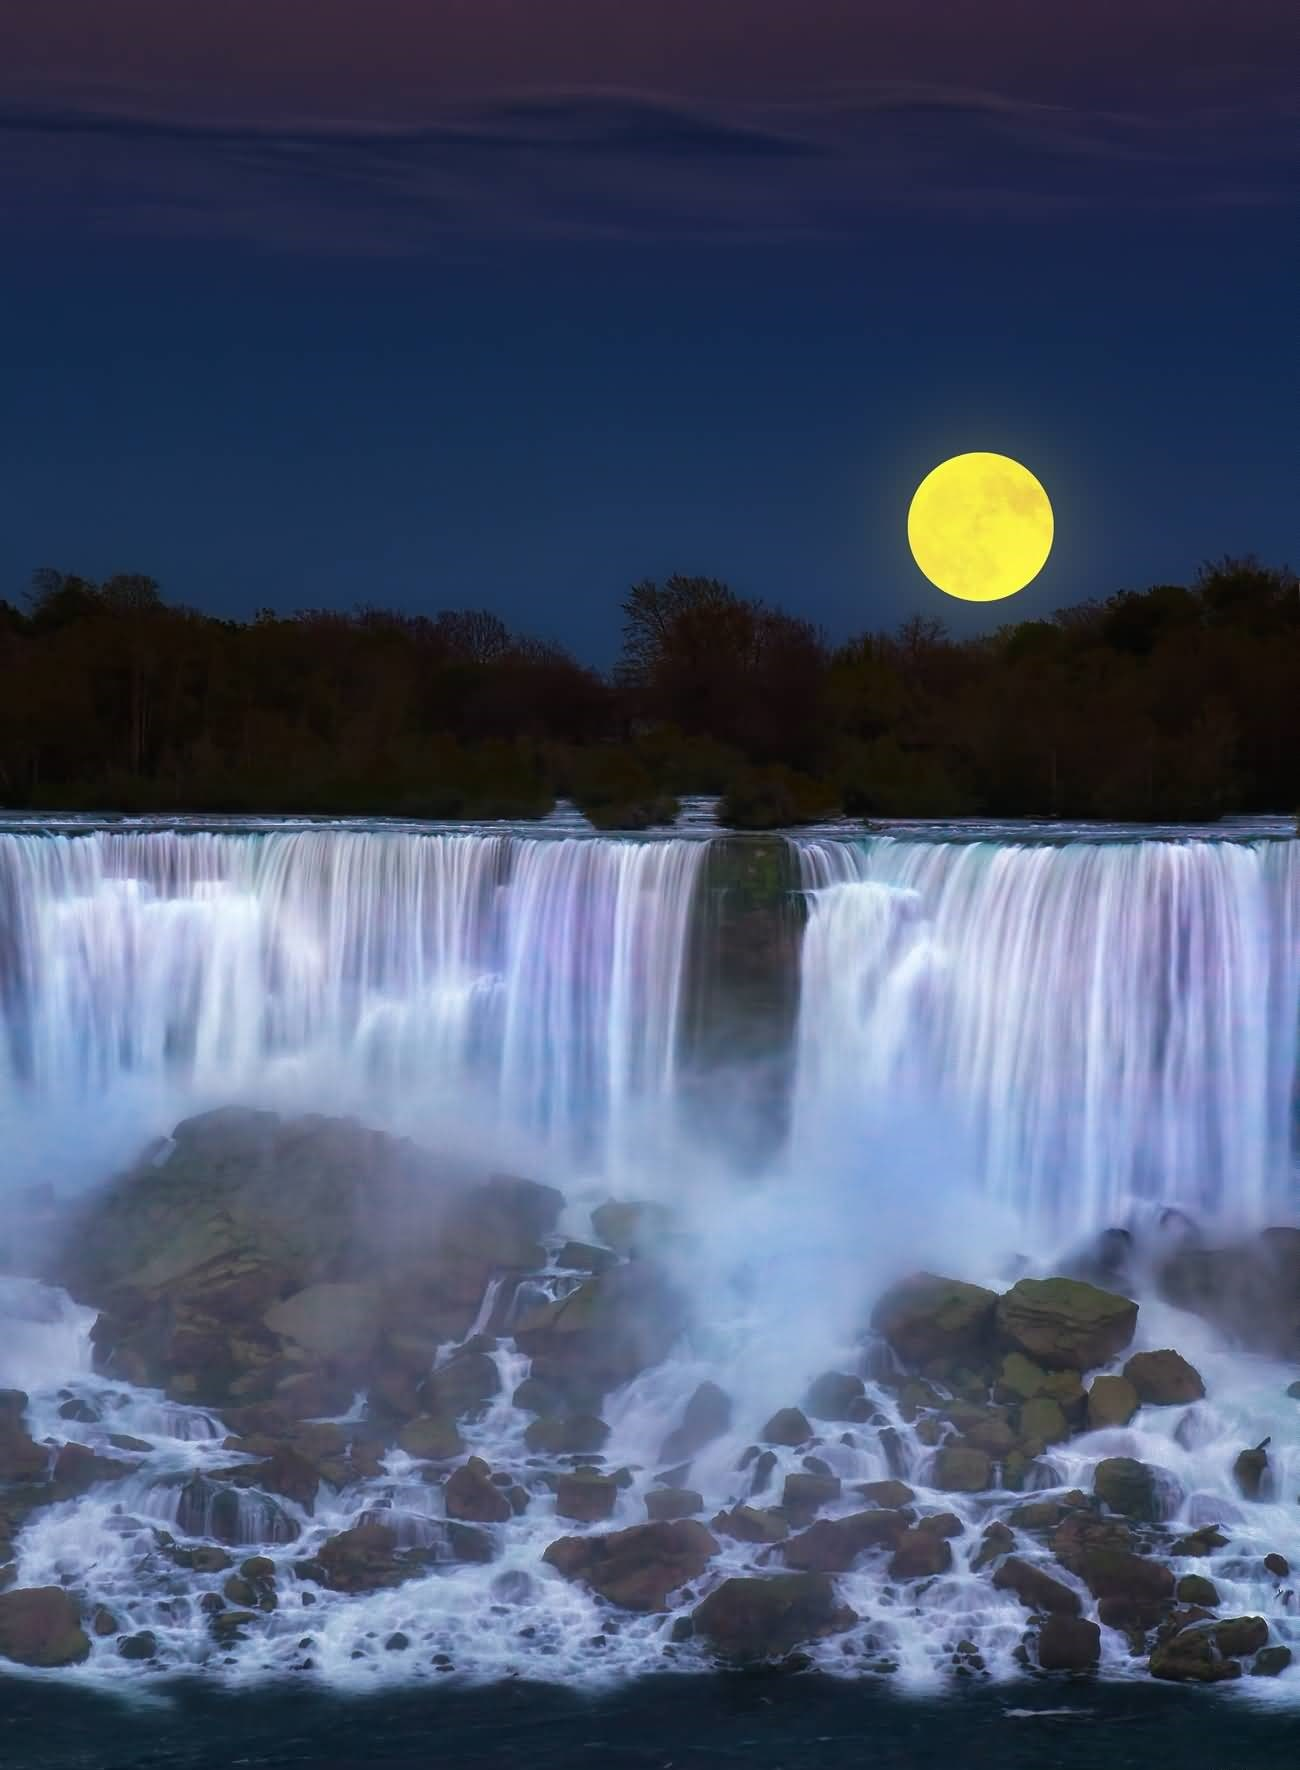 Amazing Falls Wallpaper Niagara Falls Hd Wallpapers 7wallpapers Net